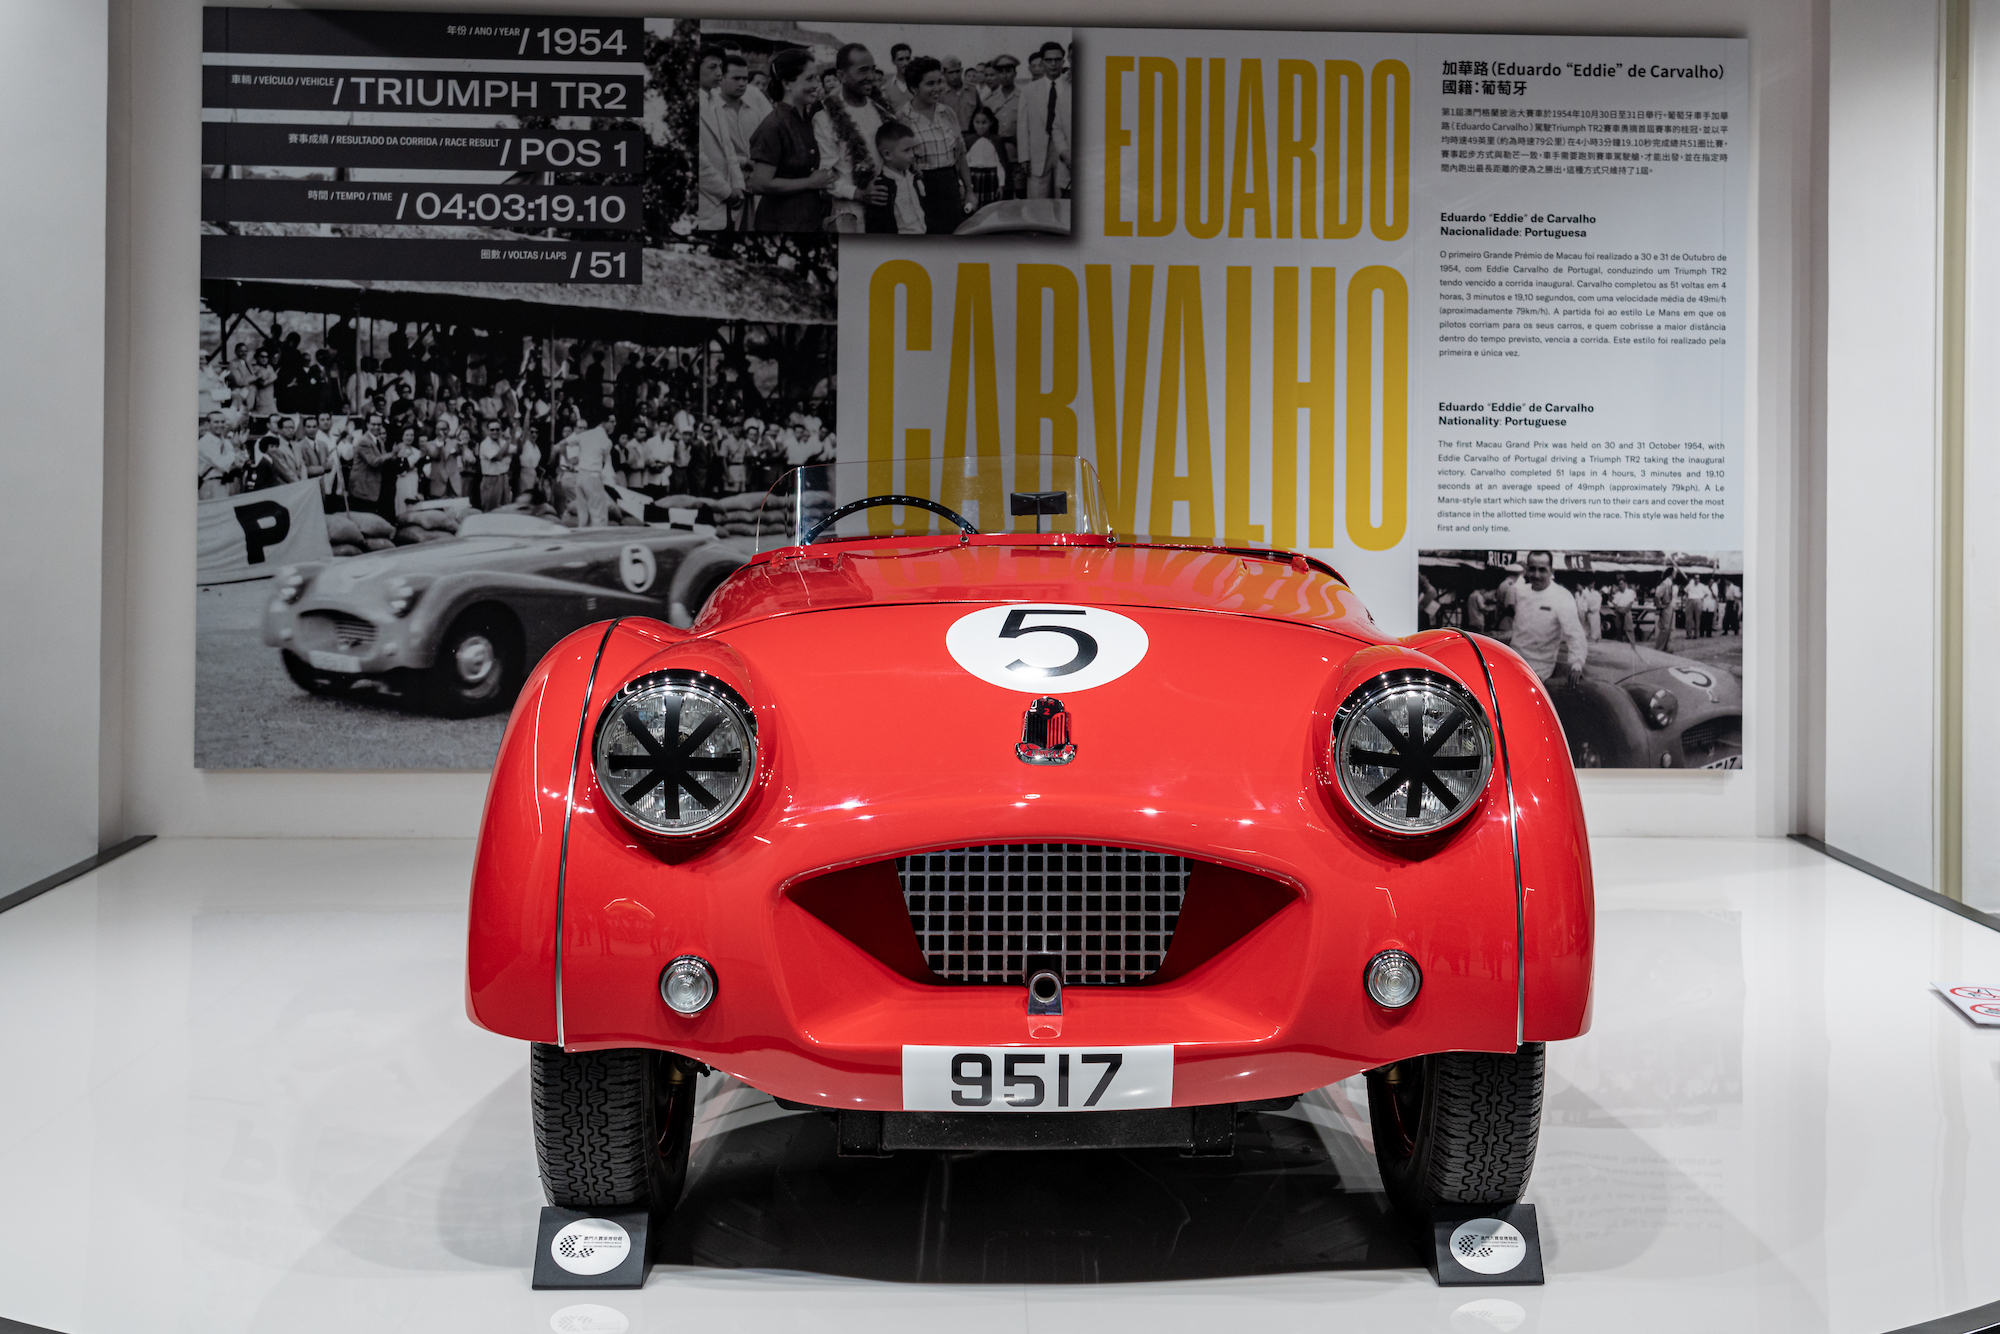 Portuguese driver, Eddie Carvalho's Triumph TR2 that won the inaugural Macau Grand Prix